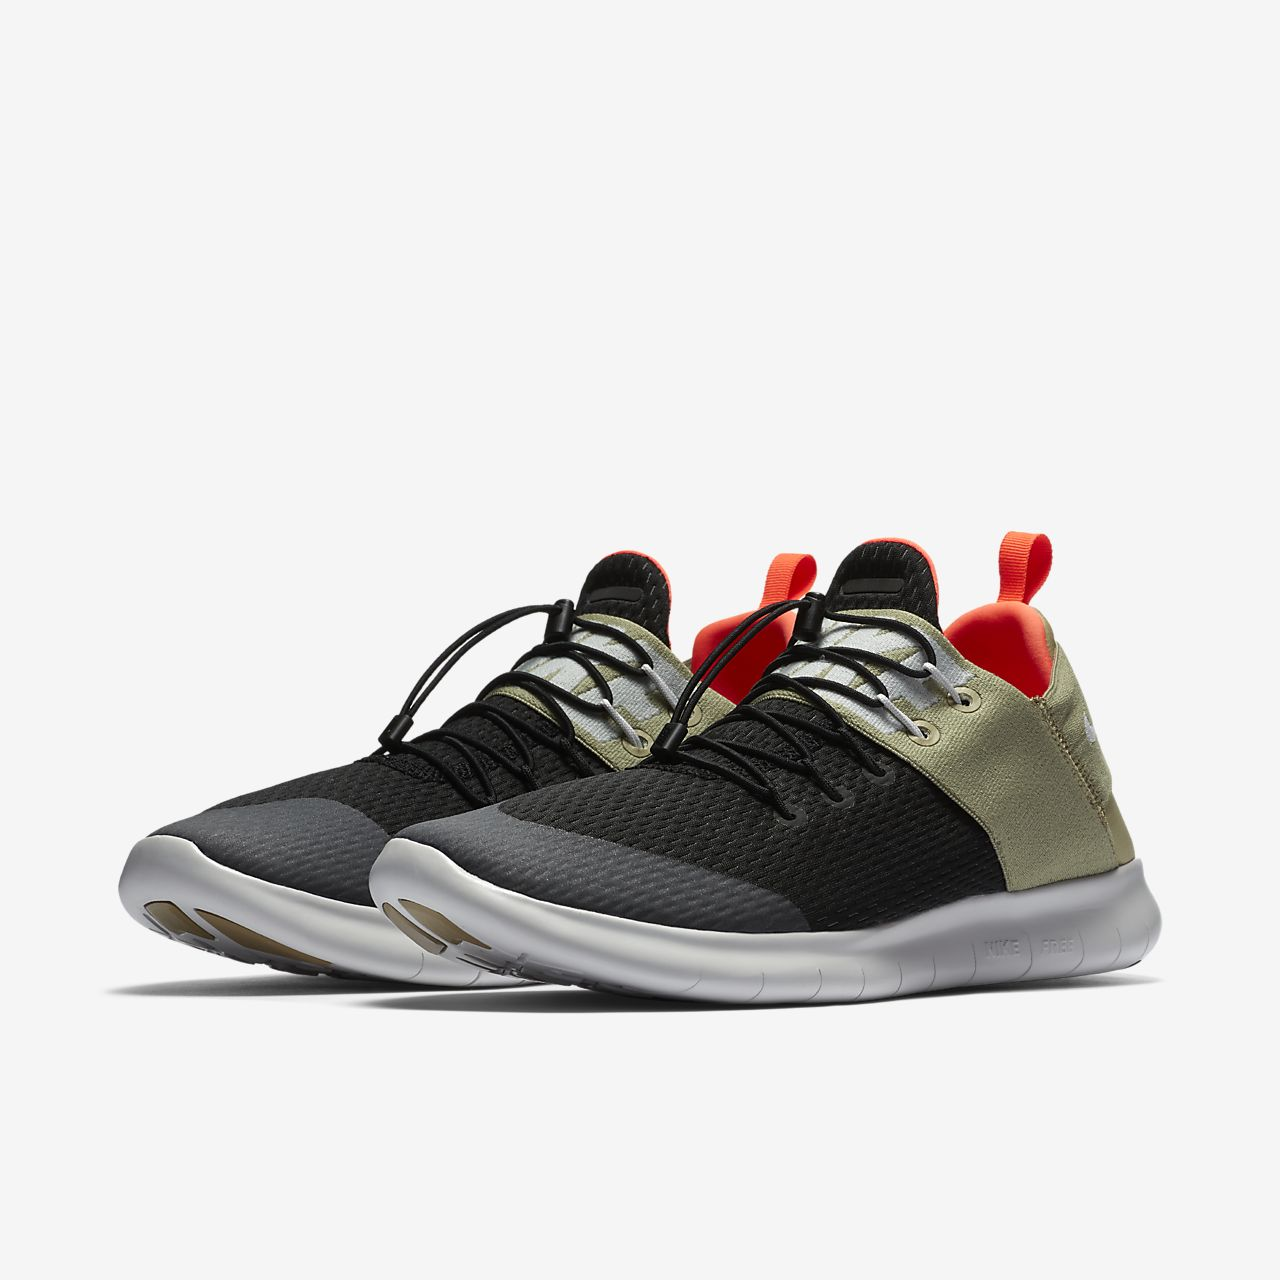 Nike Libre Rn Banlieusard 2017 Chaussures De Course Noir Noir 9ComC